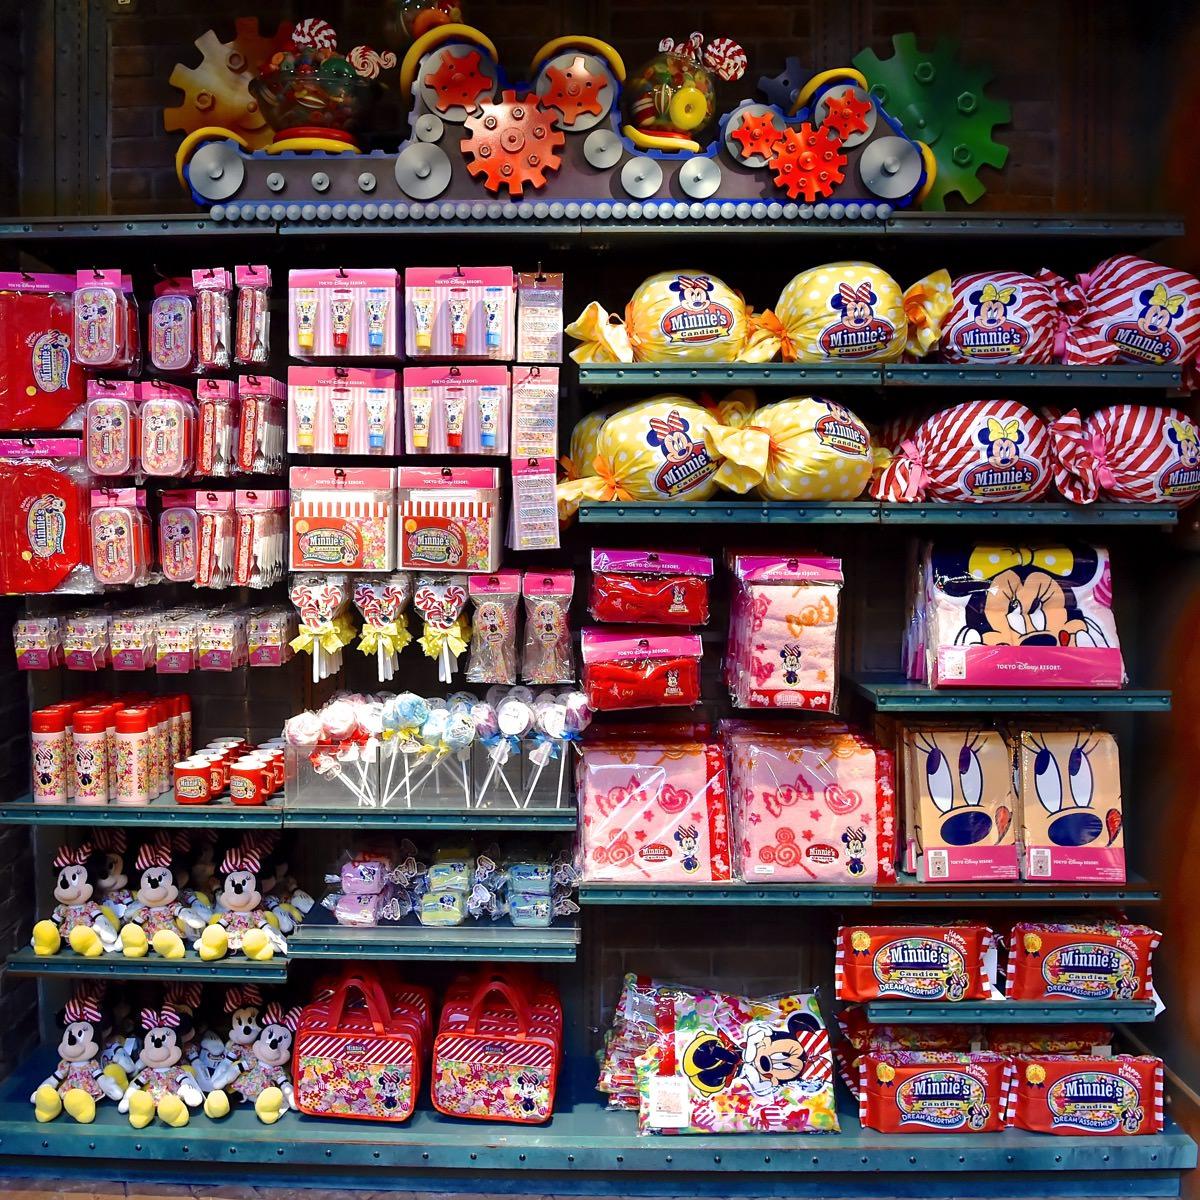 Minnies Candies(ミニーのキャンディー)グッズ